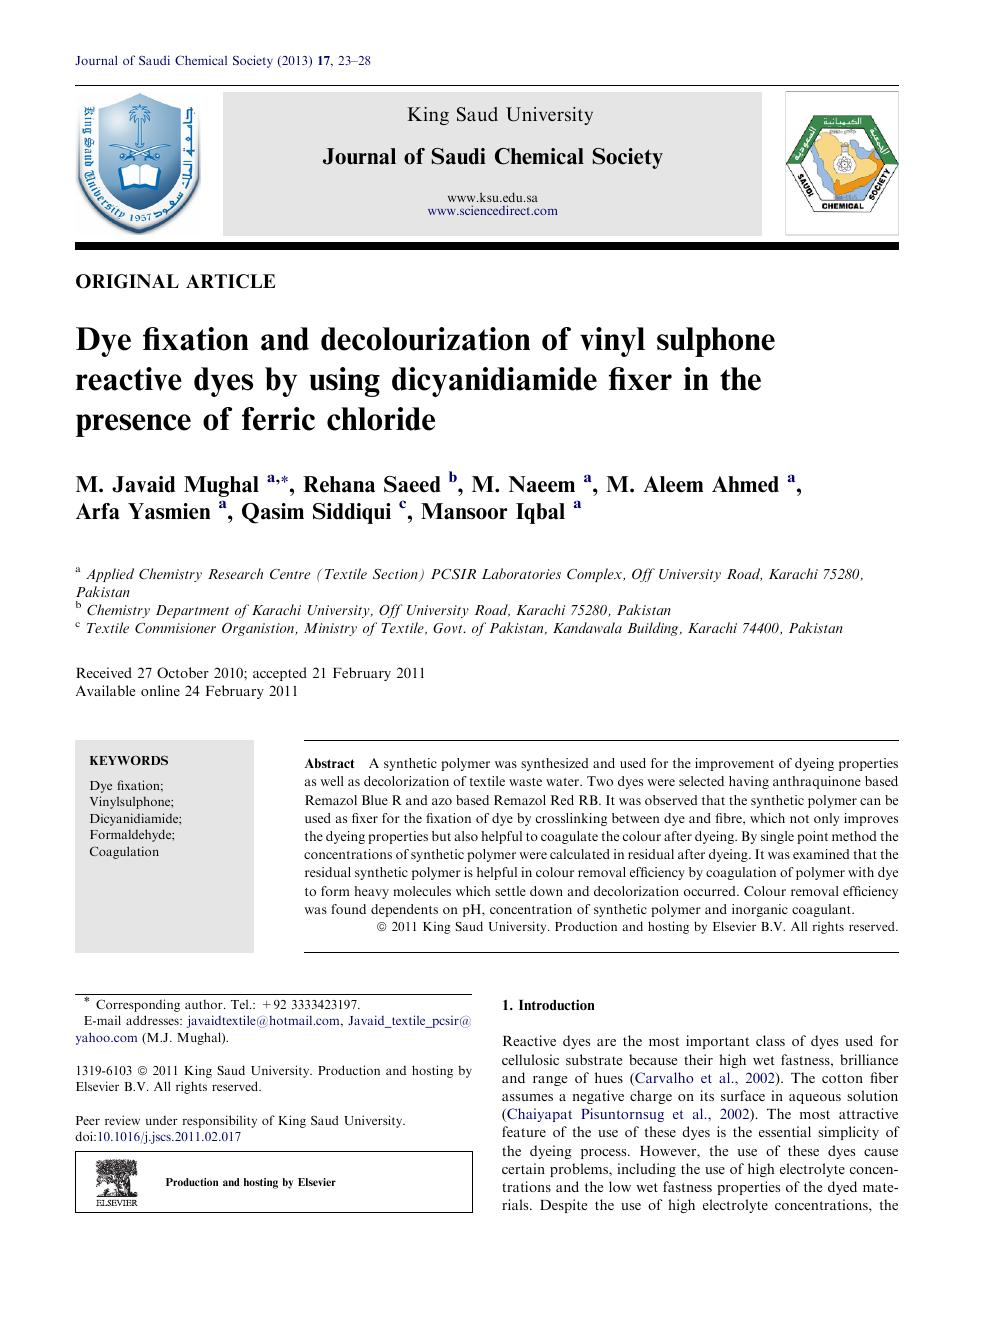 Dye fixation and decolourization of vinyl sulphone reactive